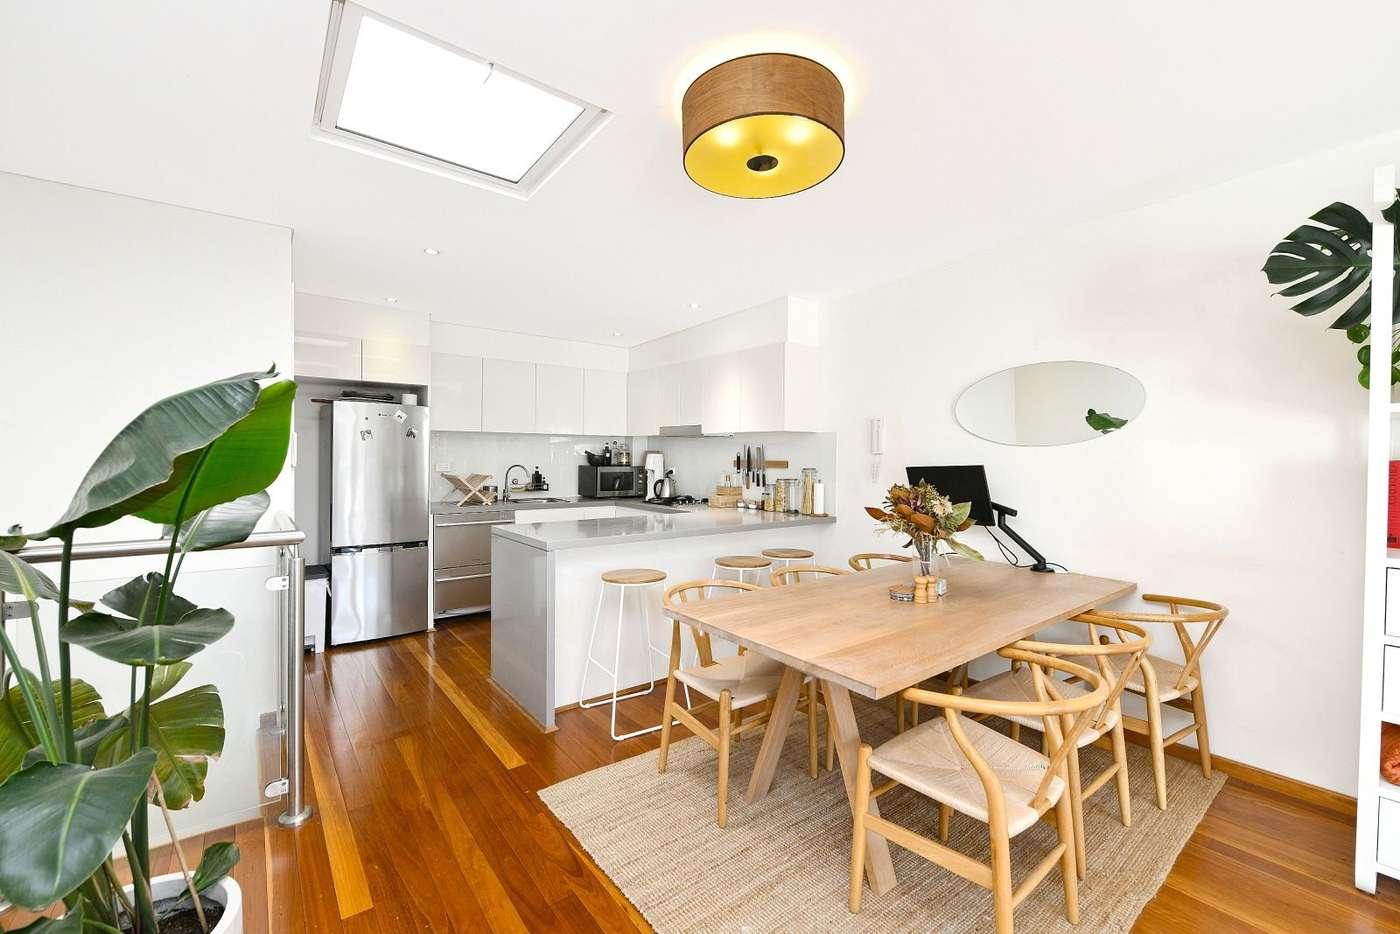 Main view of Homely apartment listing, 4/6-8 Norton Street, Leichhardt NSW 2040